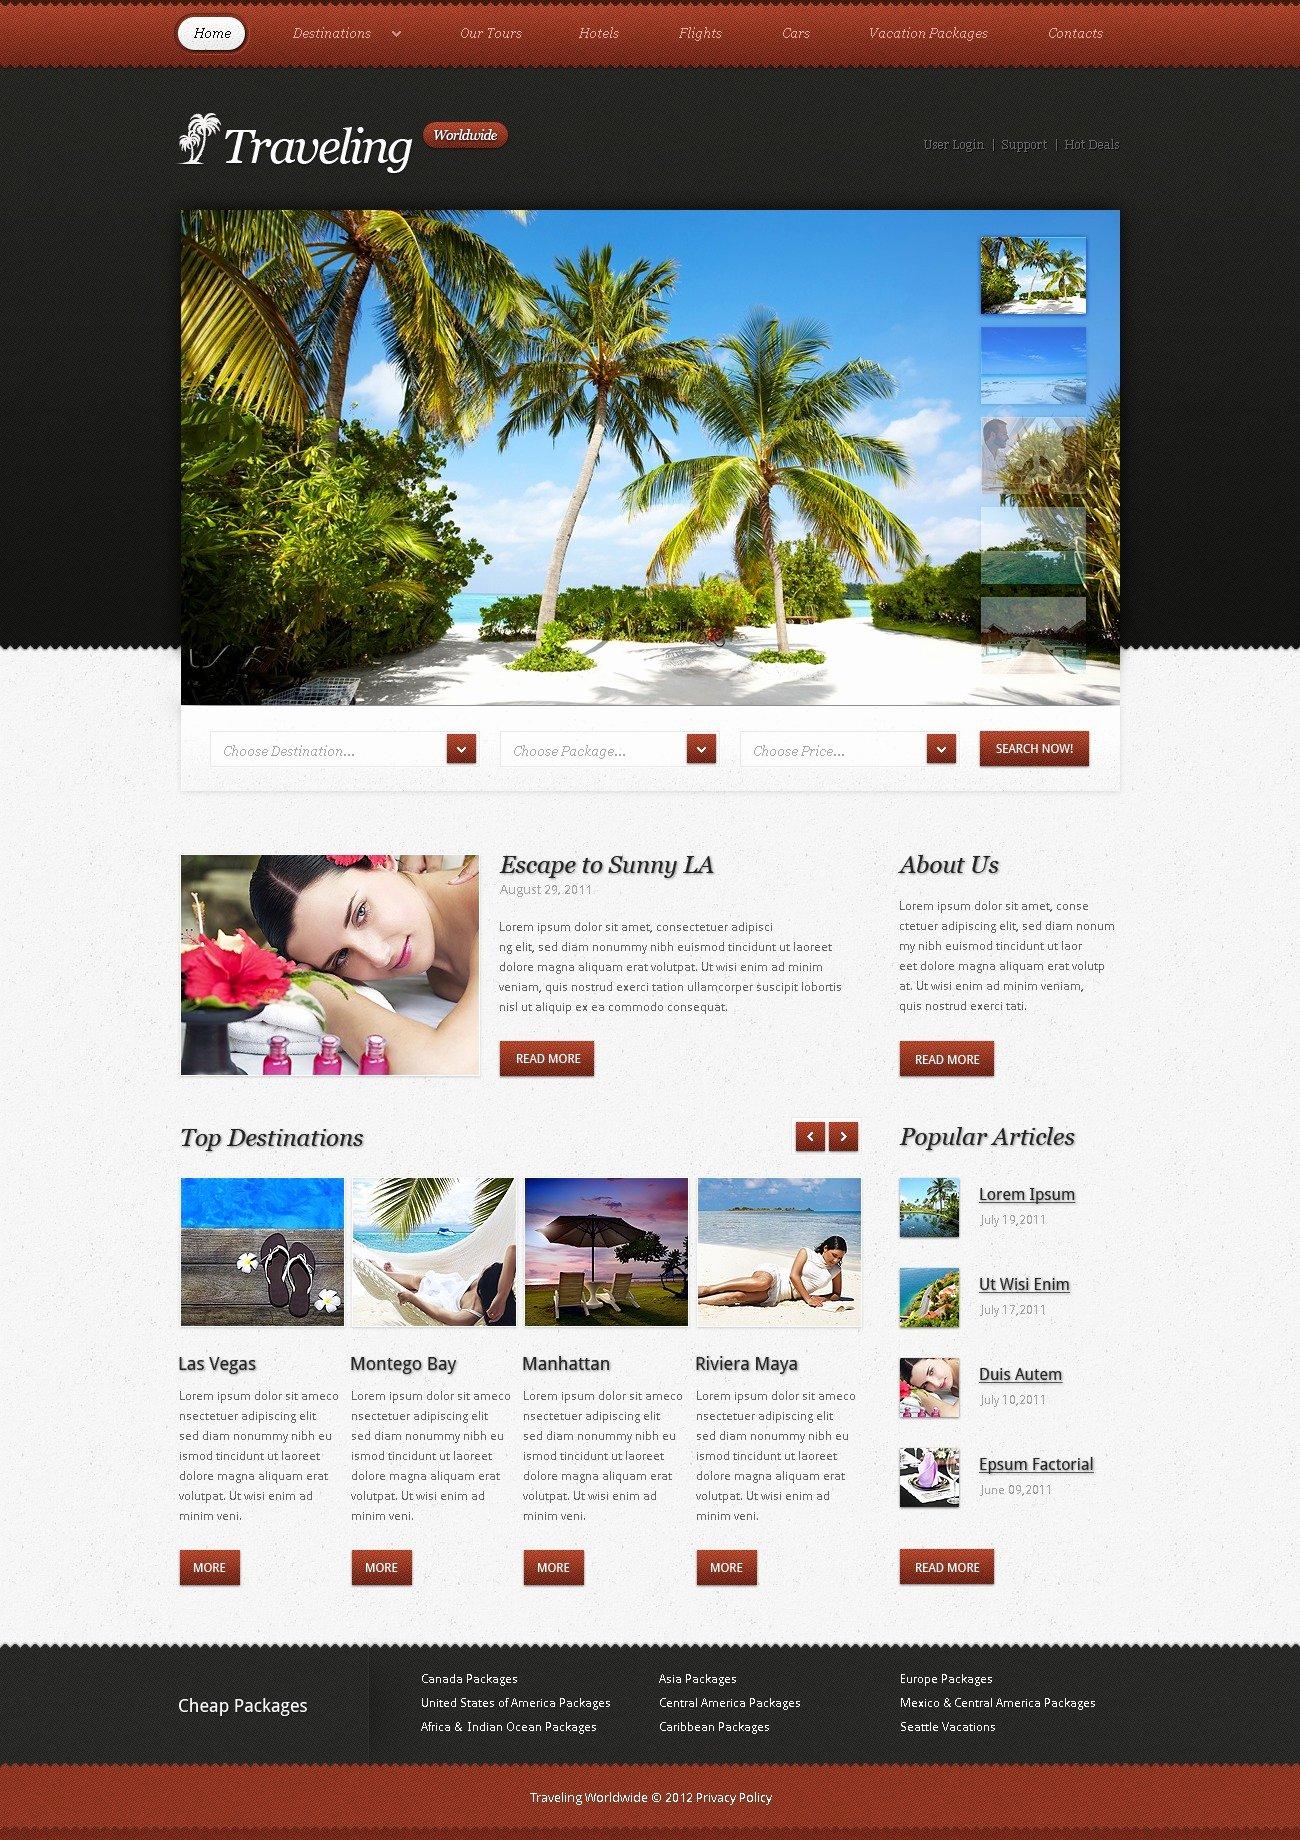 Travel Agent Website Template Lovely Travel Agency Website Template